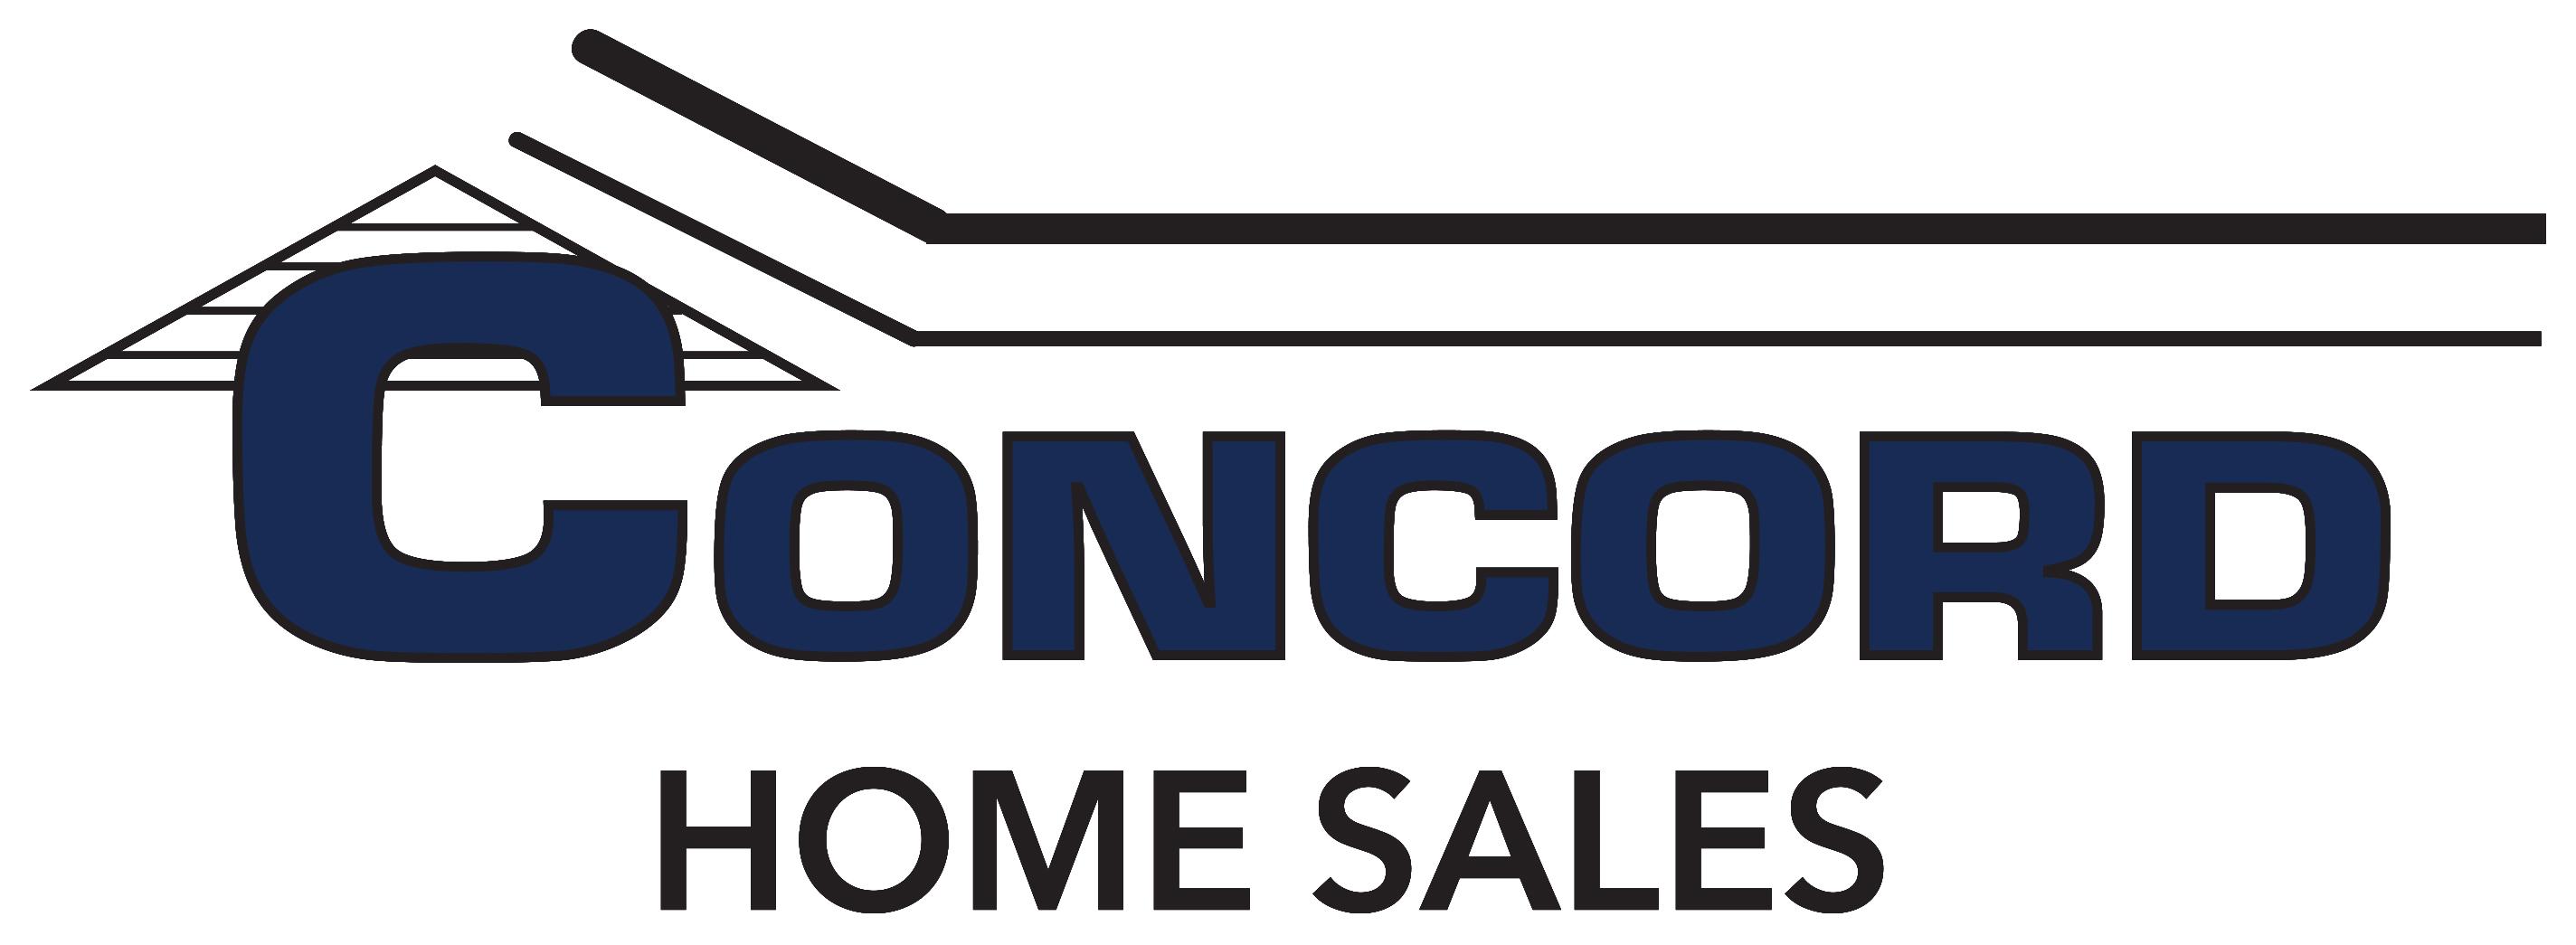 Concord Home Sales